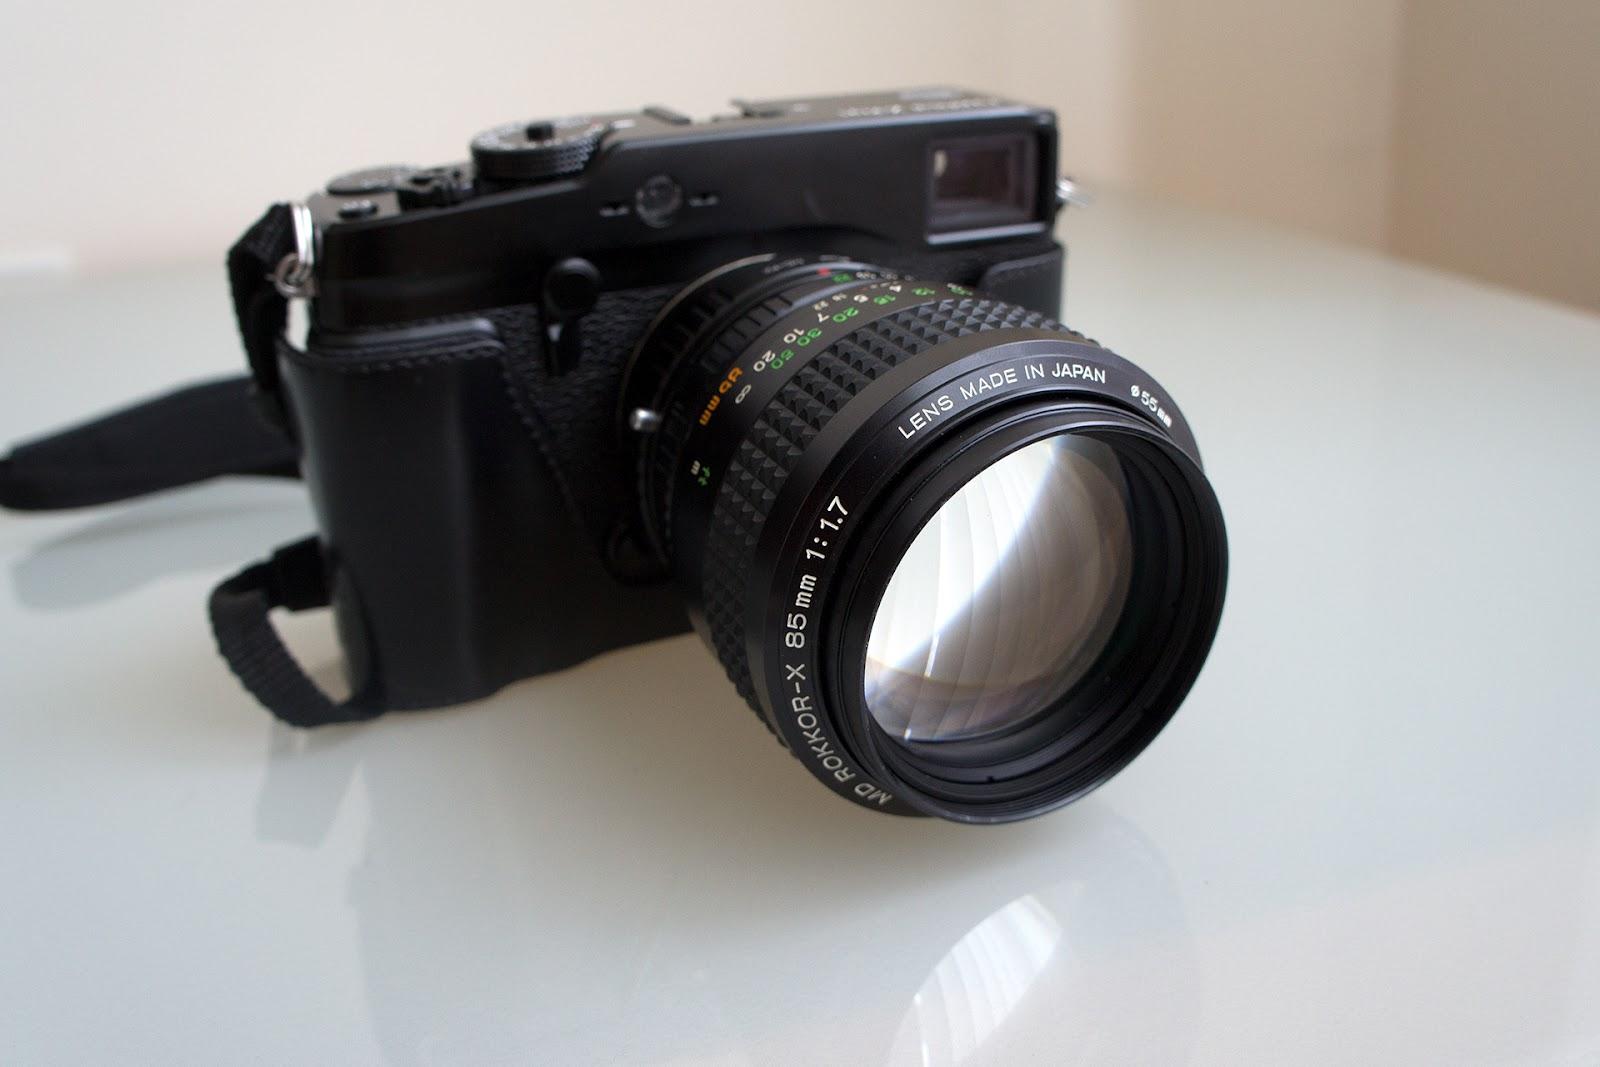 vk photo blog: X-PRO 1 + MD ROKKOR-X 85mm 1:1 7 (part 1)